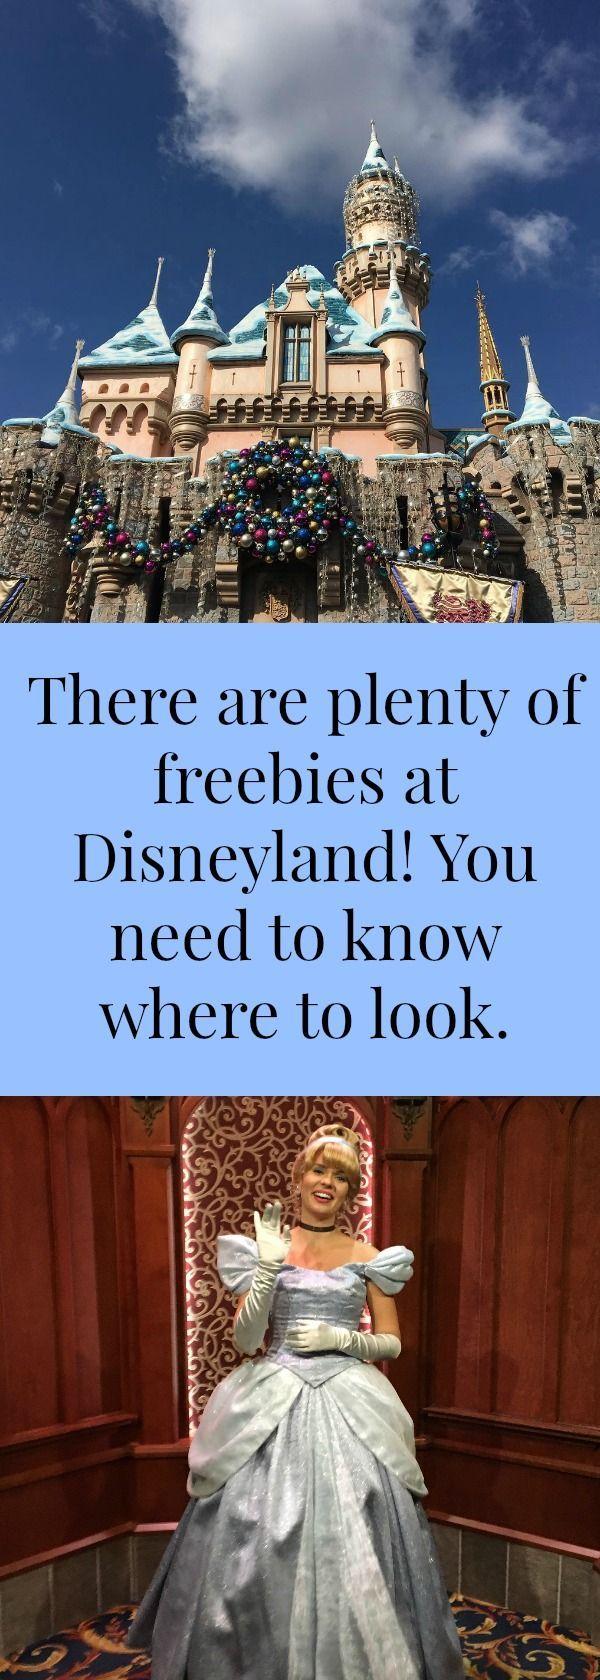 Where to get freebies at Disneyland.